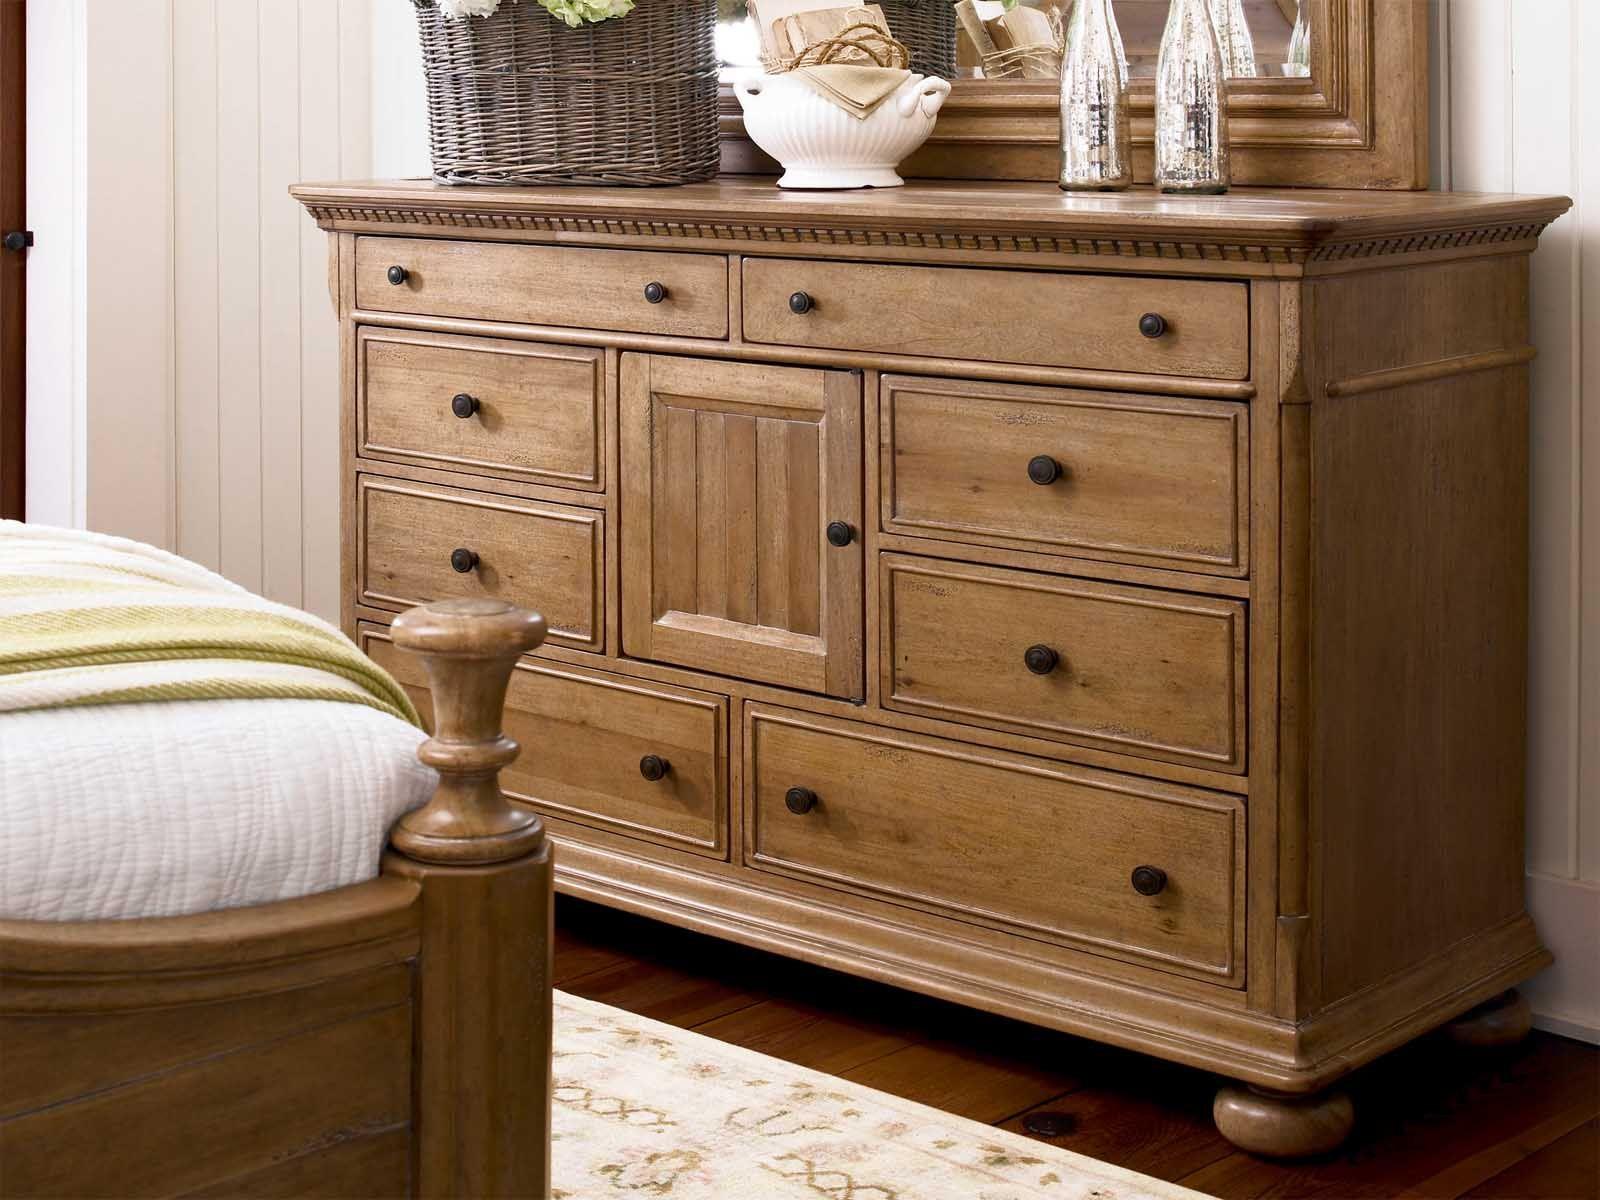 wood dresser plans  bestdressers  - plans to build a wooden dresser bestdressers